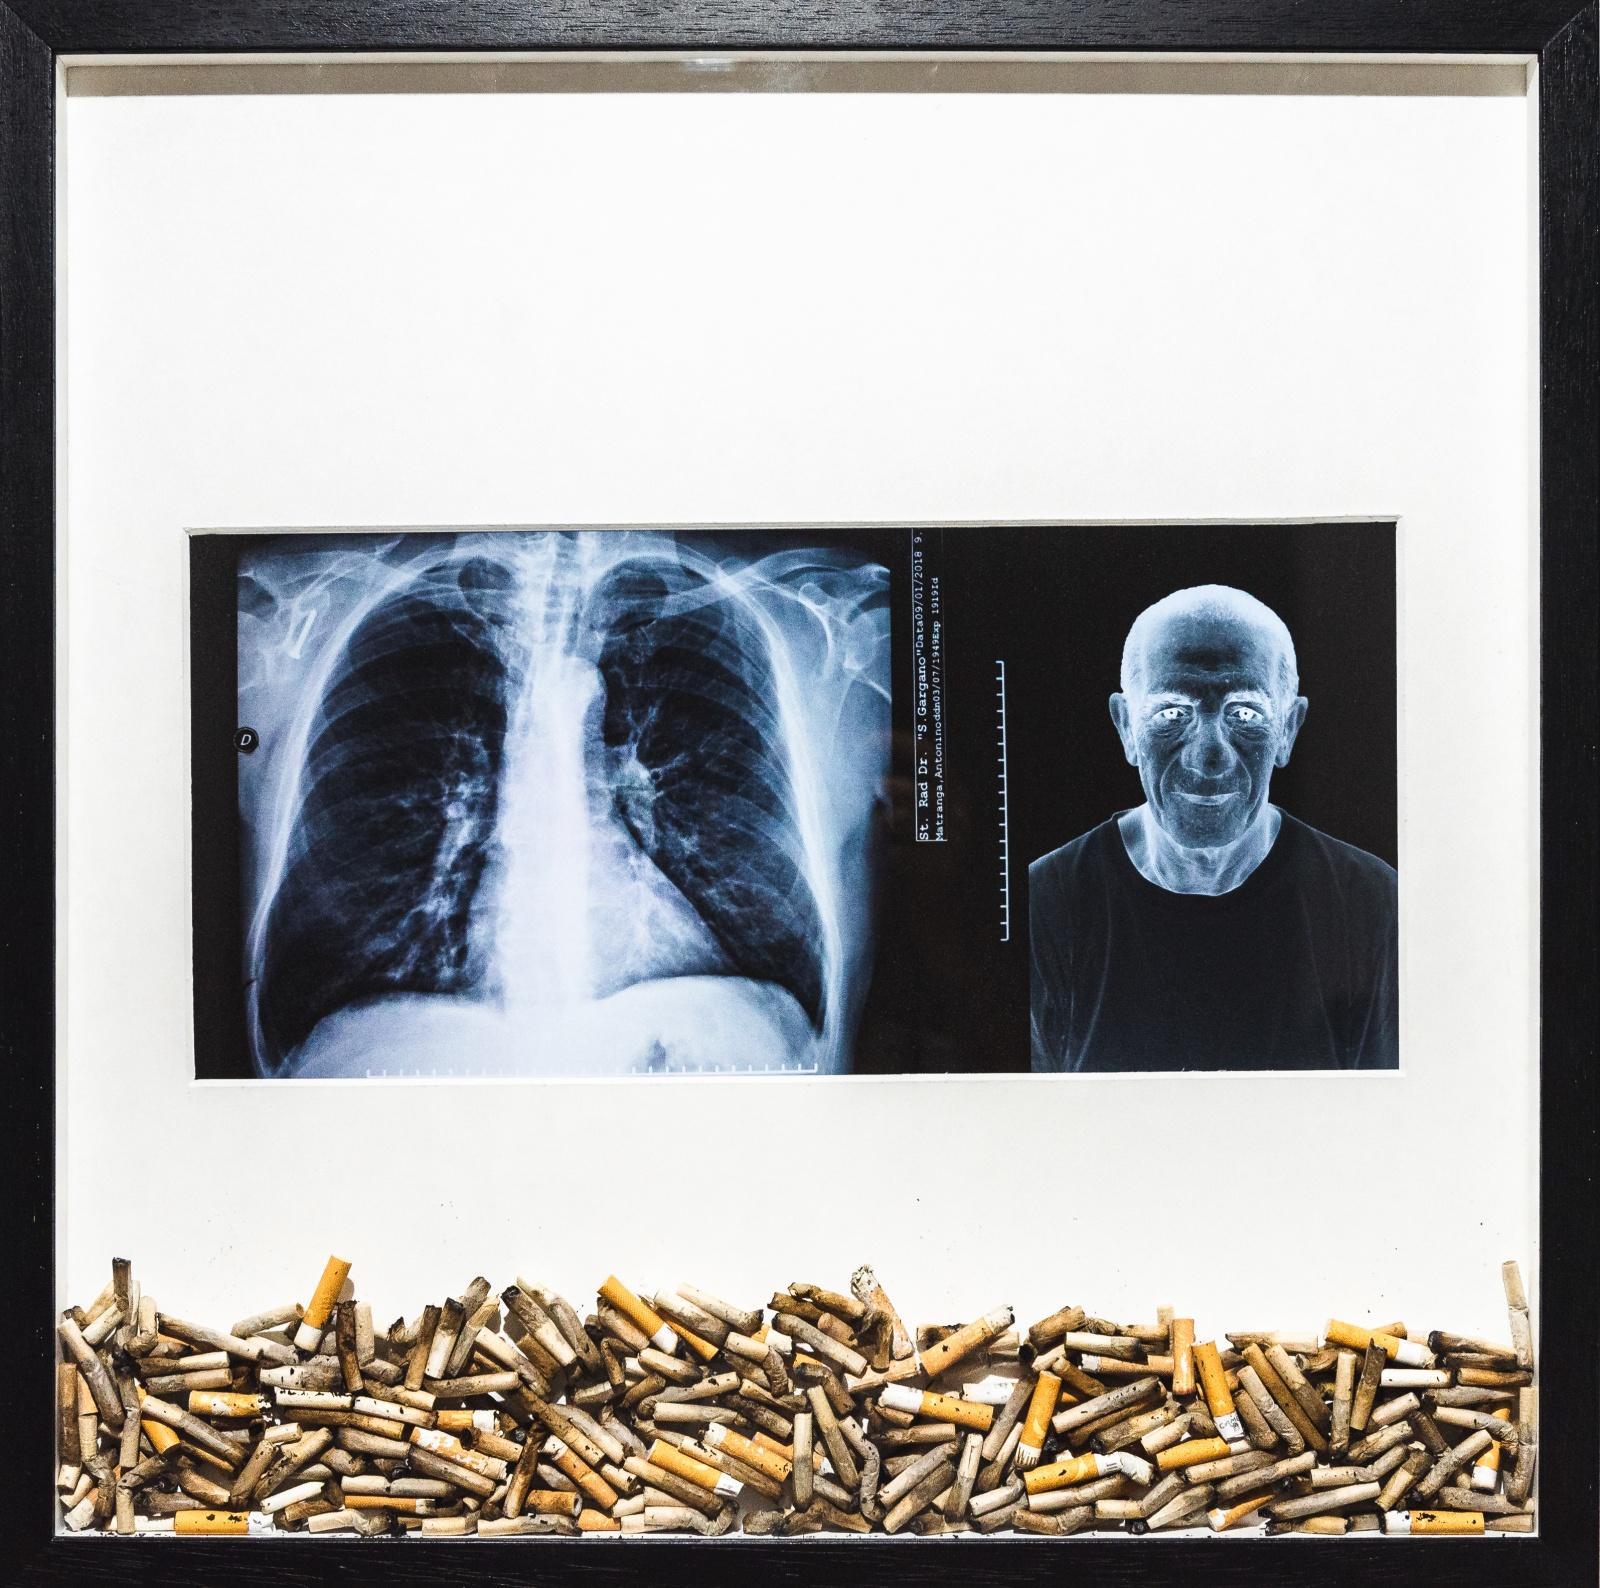 Posacenere, 2021 - carta silk, passpartout, sigarette, legno - 50x50cm